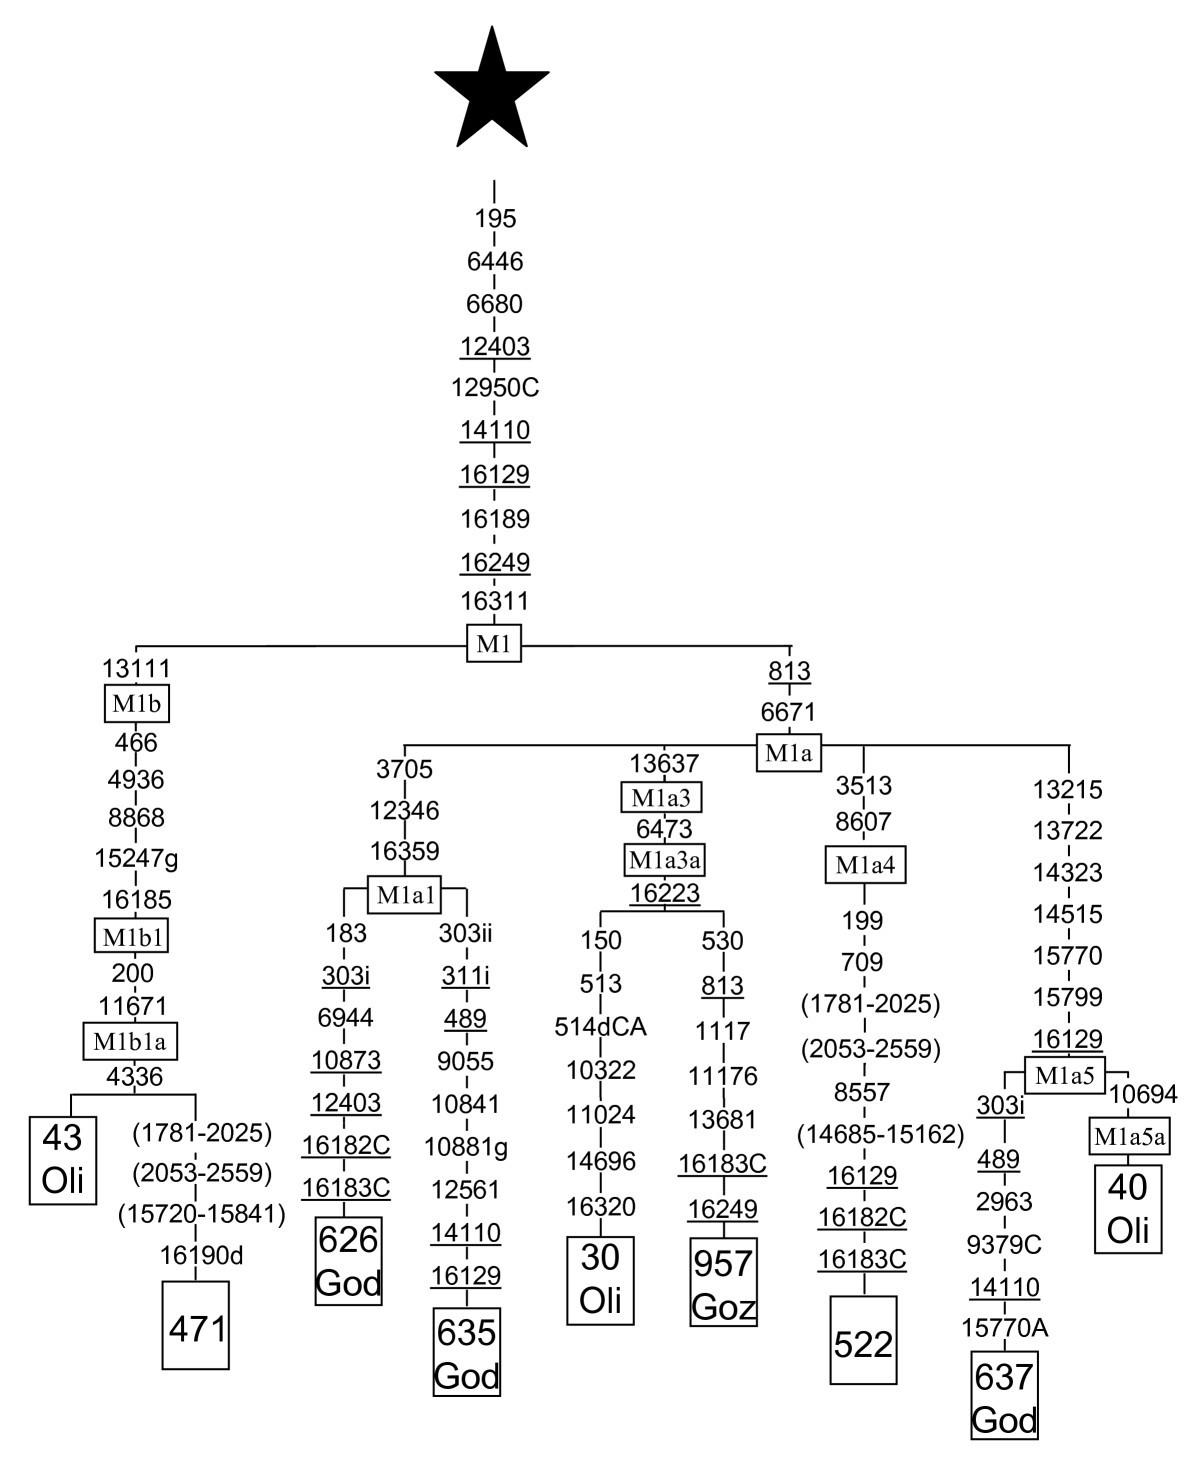 Mitochondrial Dna Structure In The Arabian Peninsula Bmc